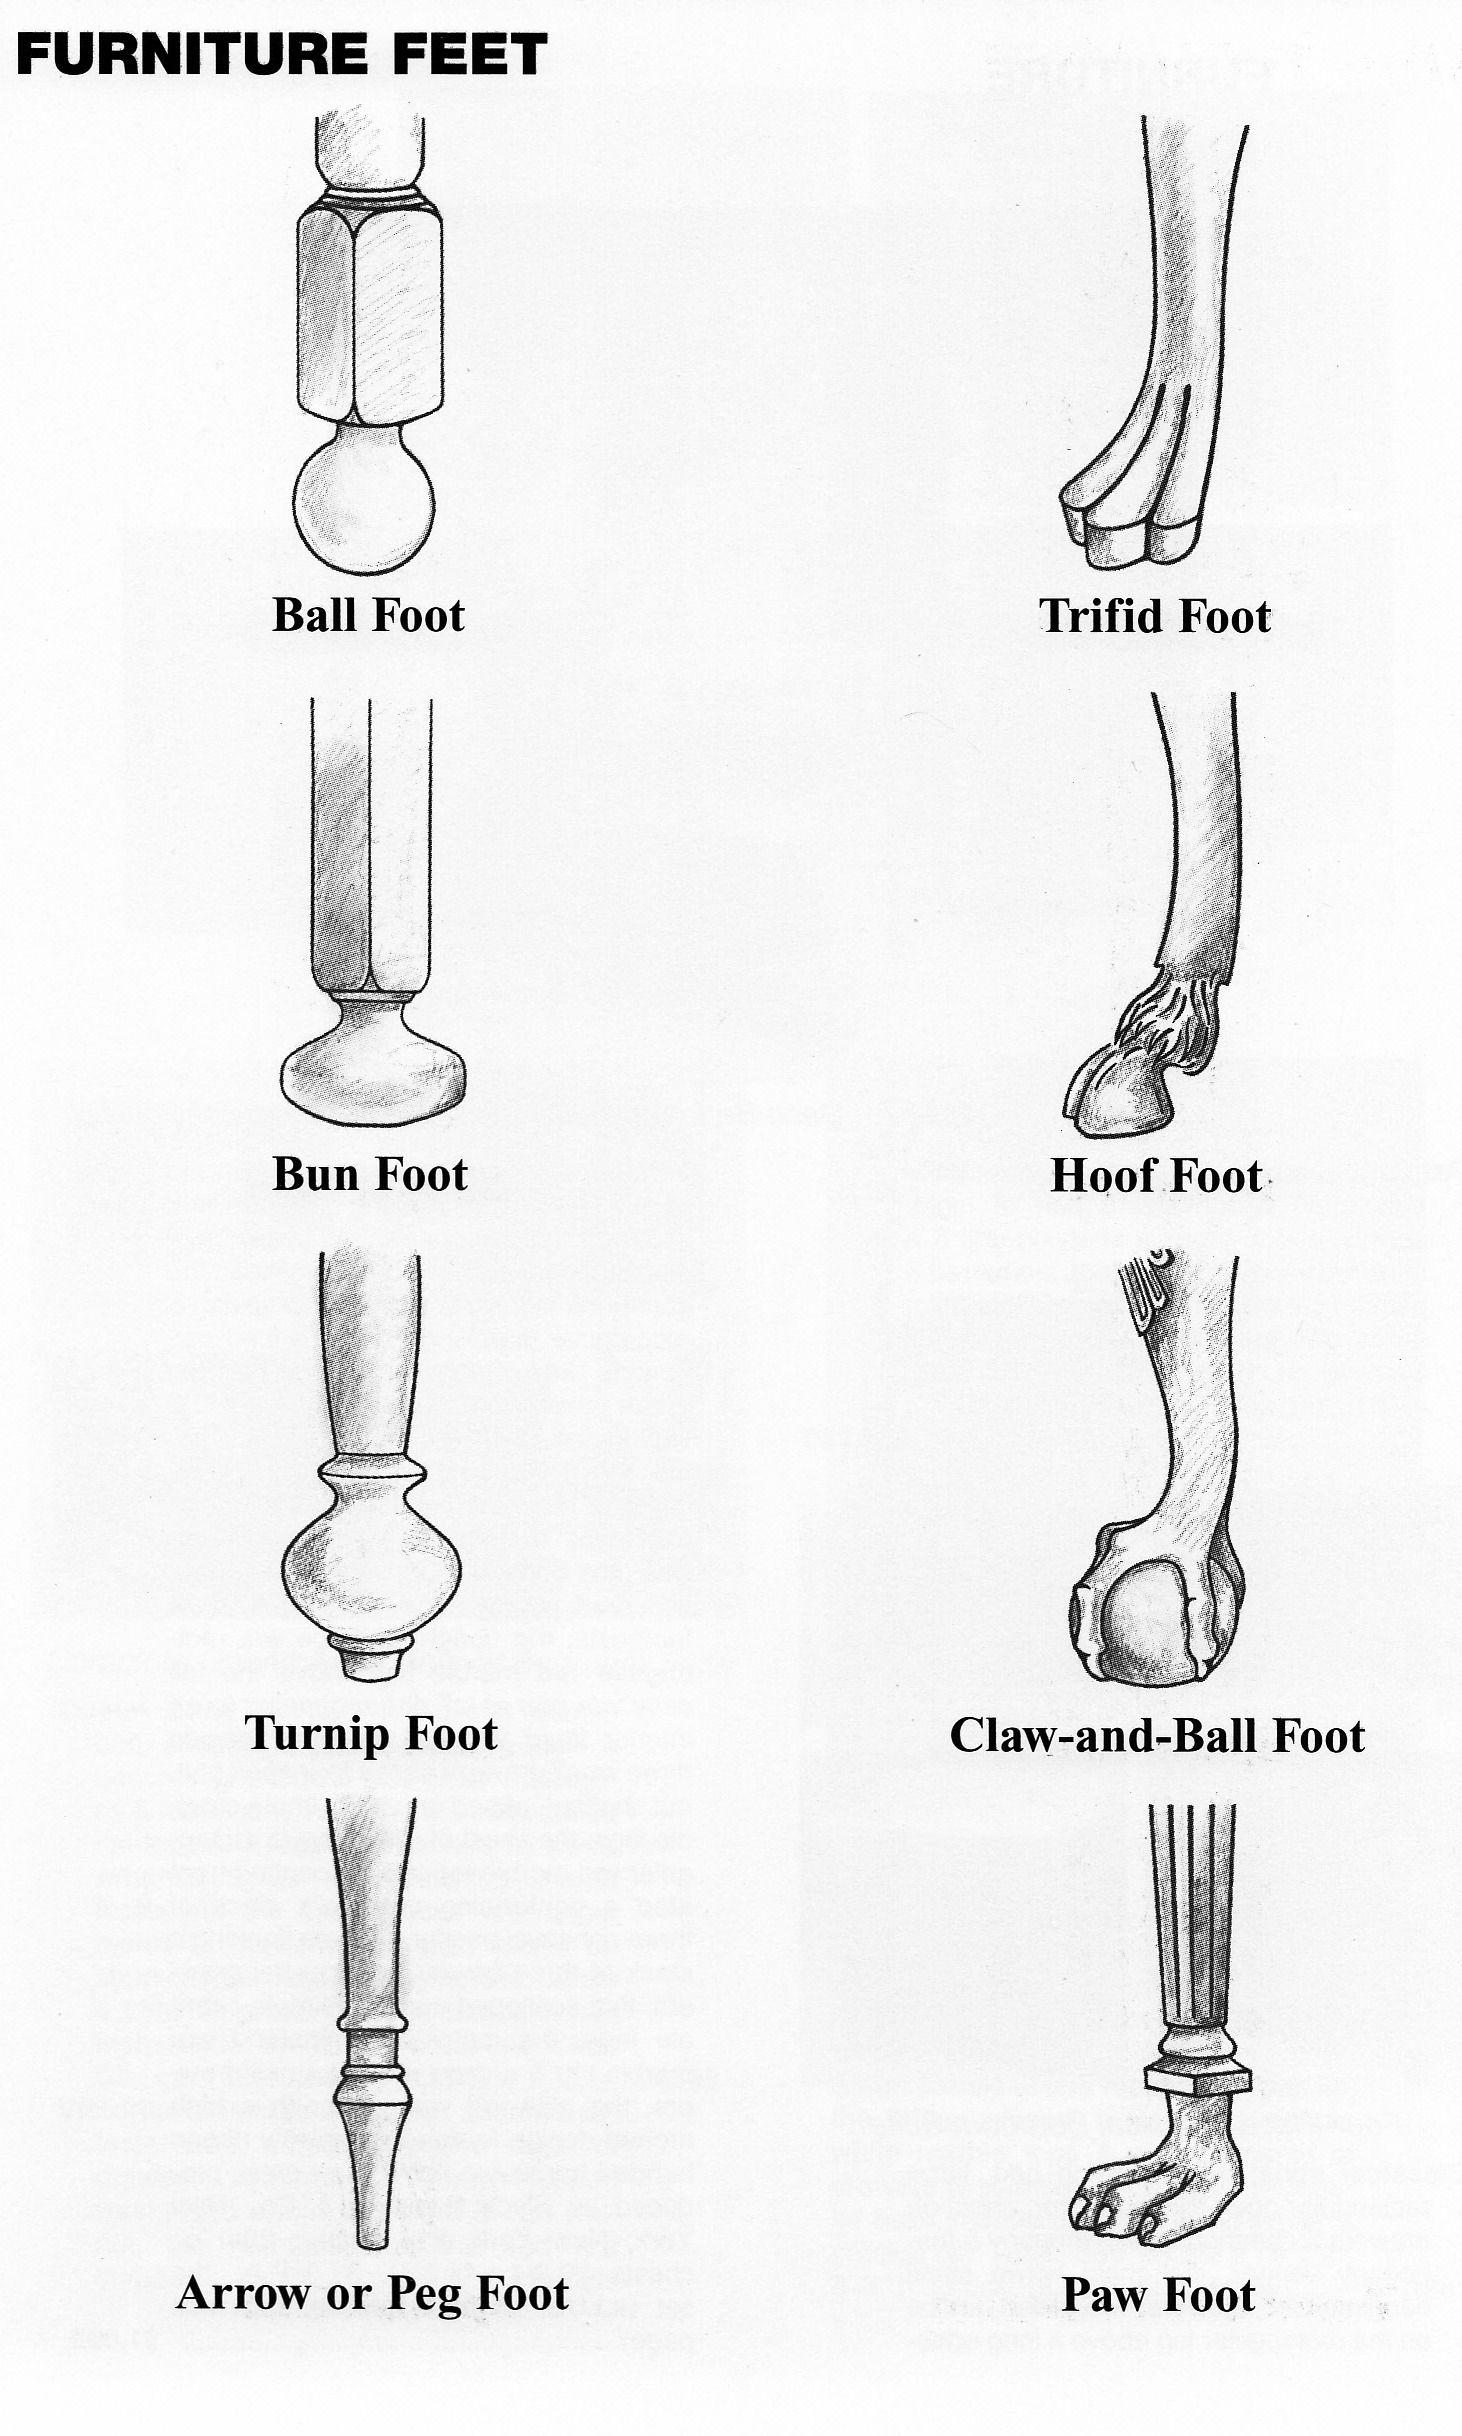 Diagrams Of Furniture Feet